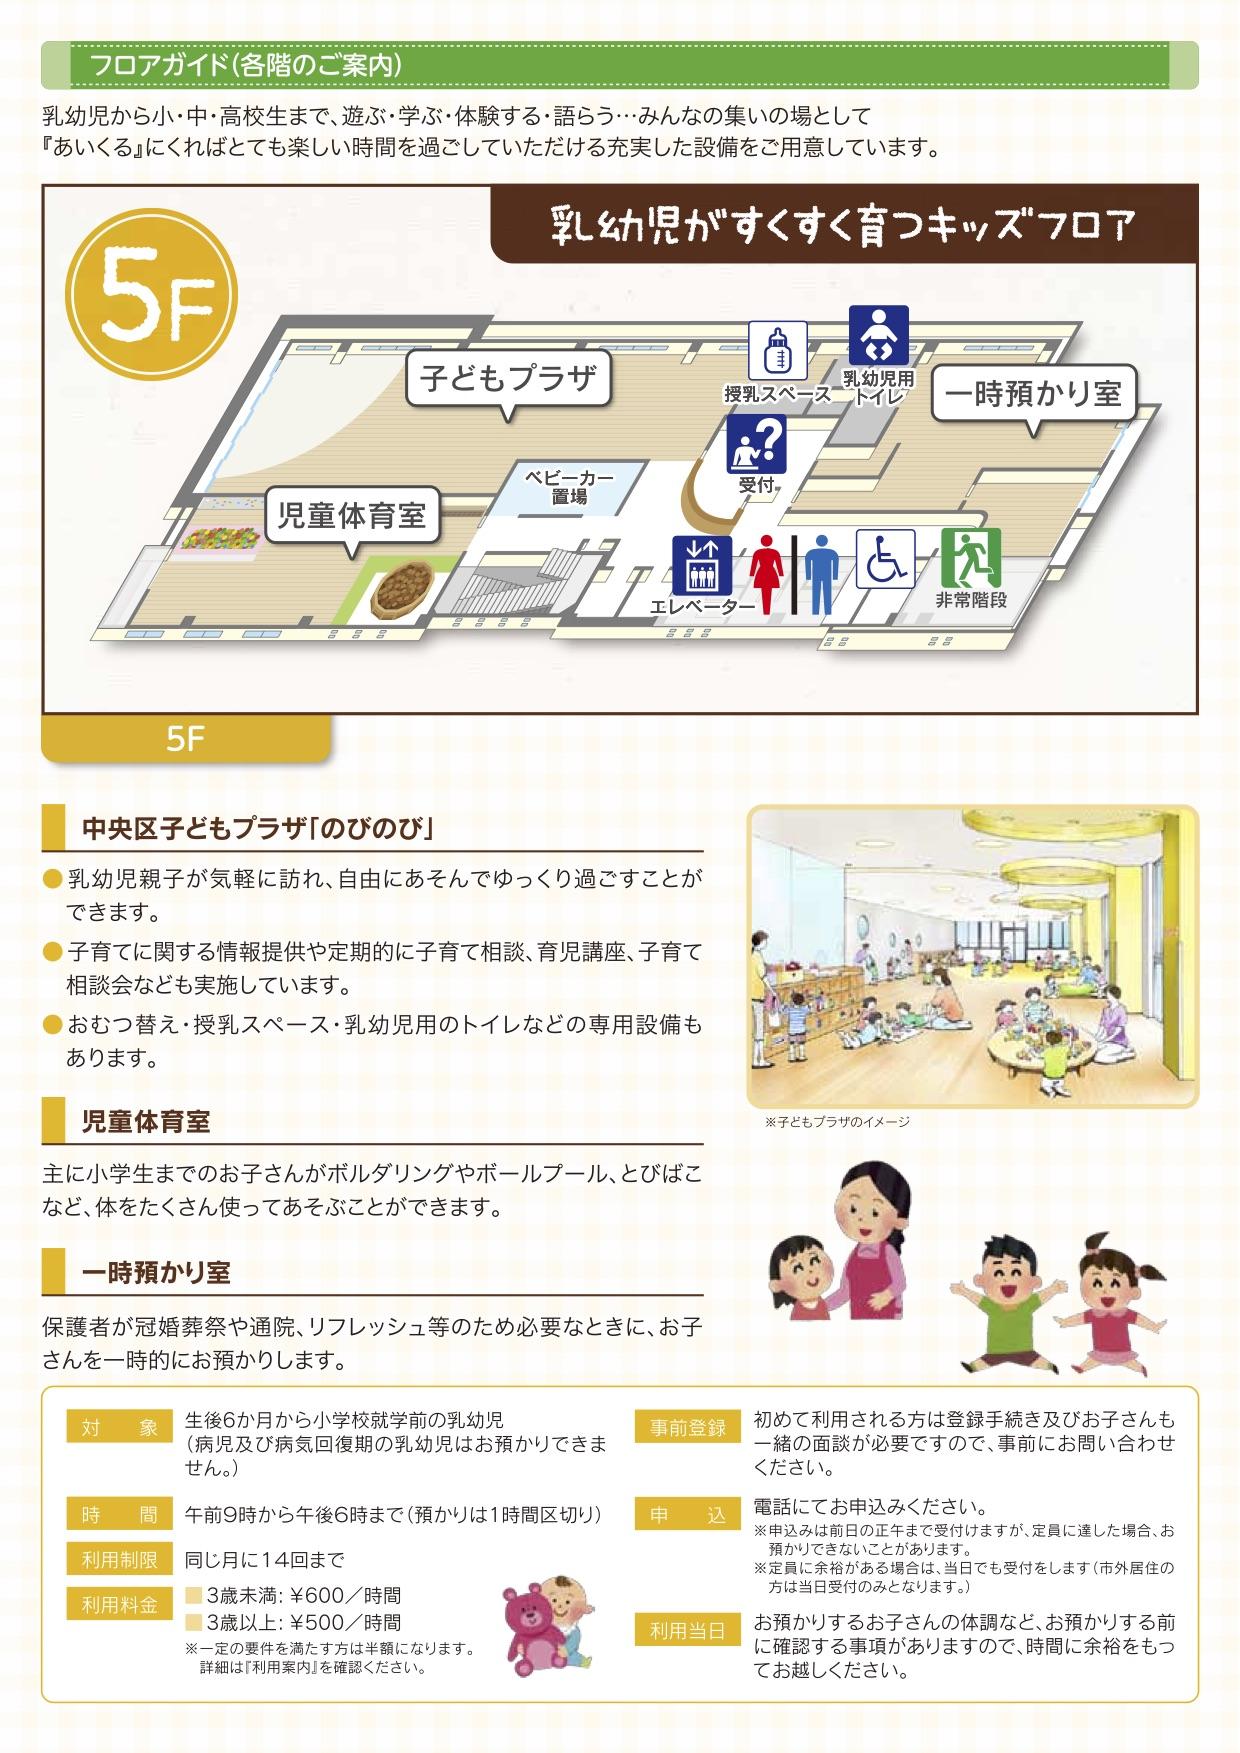 5f_floorguide2